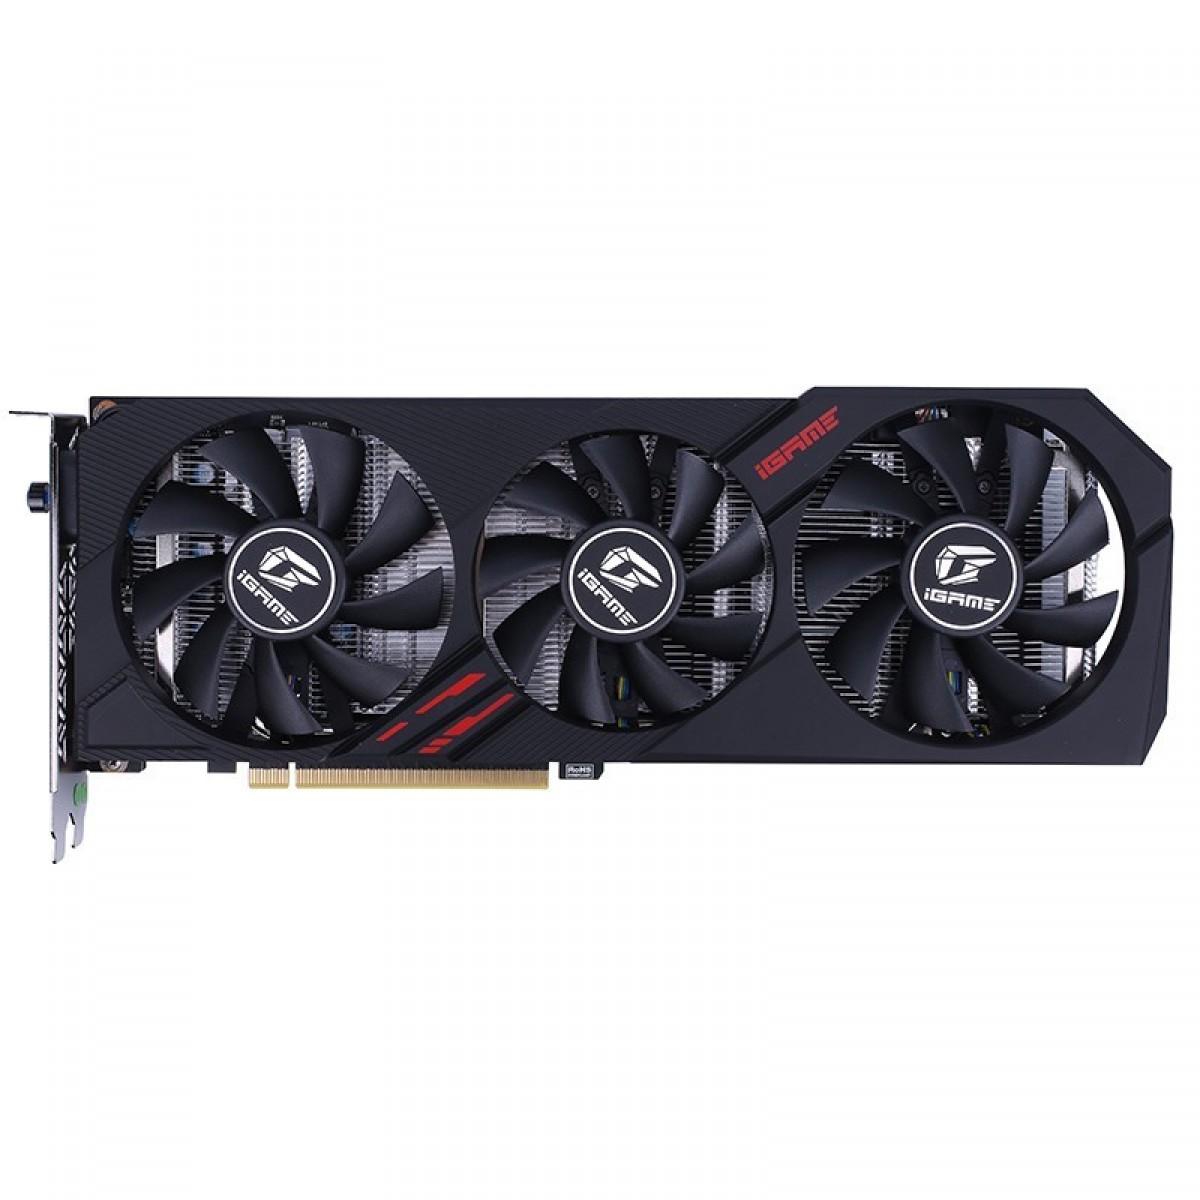 Placa de Vídeo Colorful iGame, Geforce, RTX 2060, 6GB GDDR6, 192Bit, RTX 2060 Ultra-V Triple